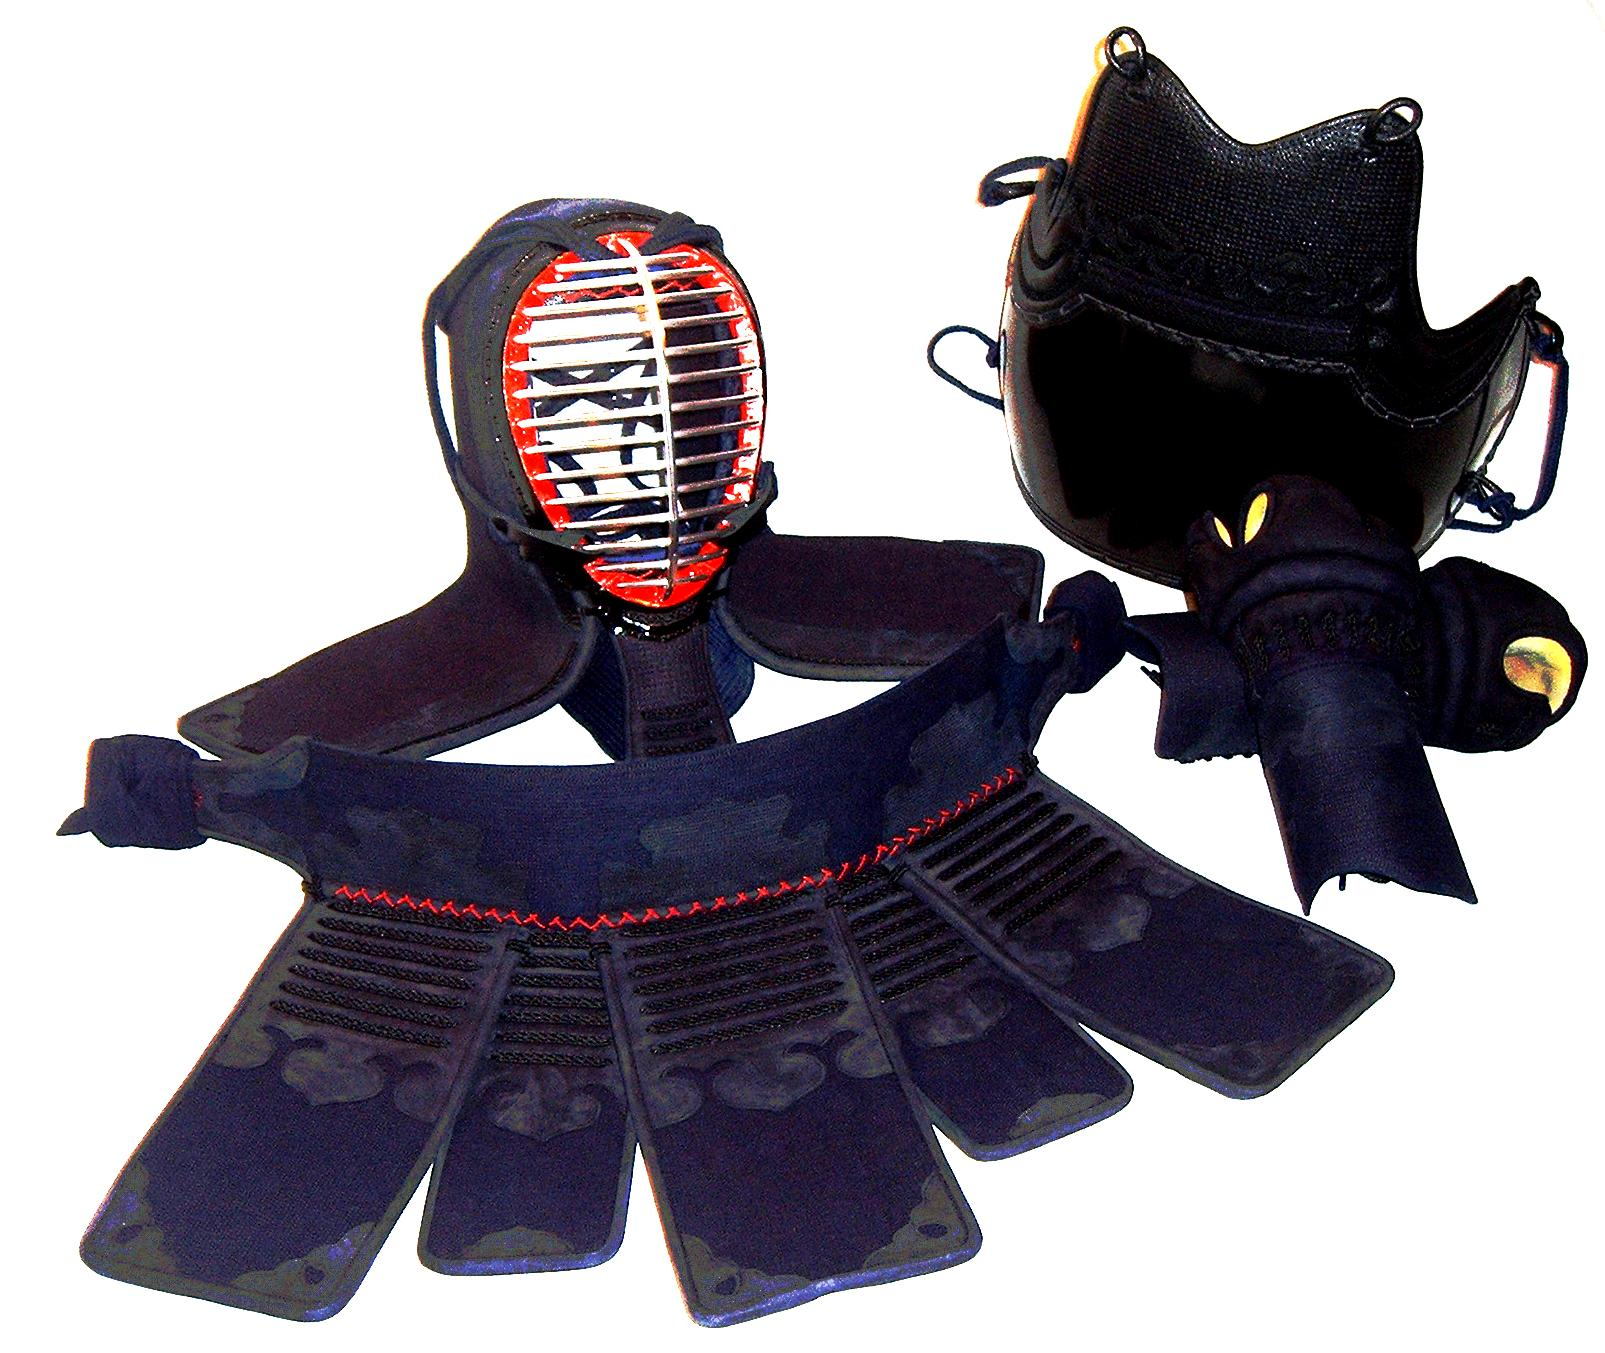 Martial Arts Kendo Armor Bogu complete Sparring Uniform Japanese Equipment